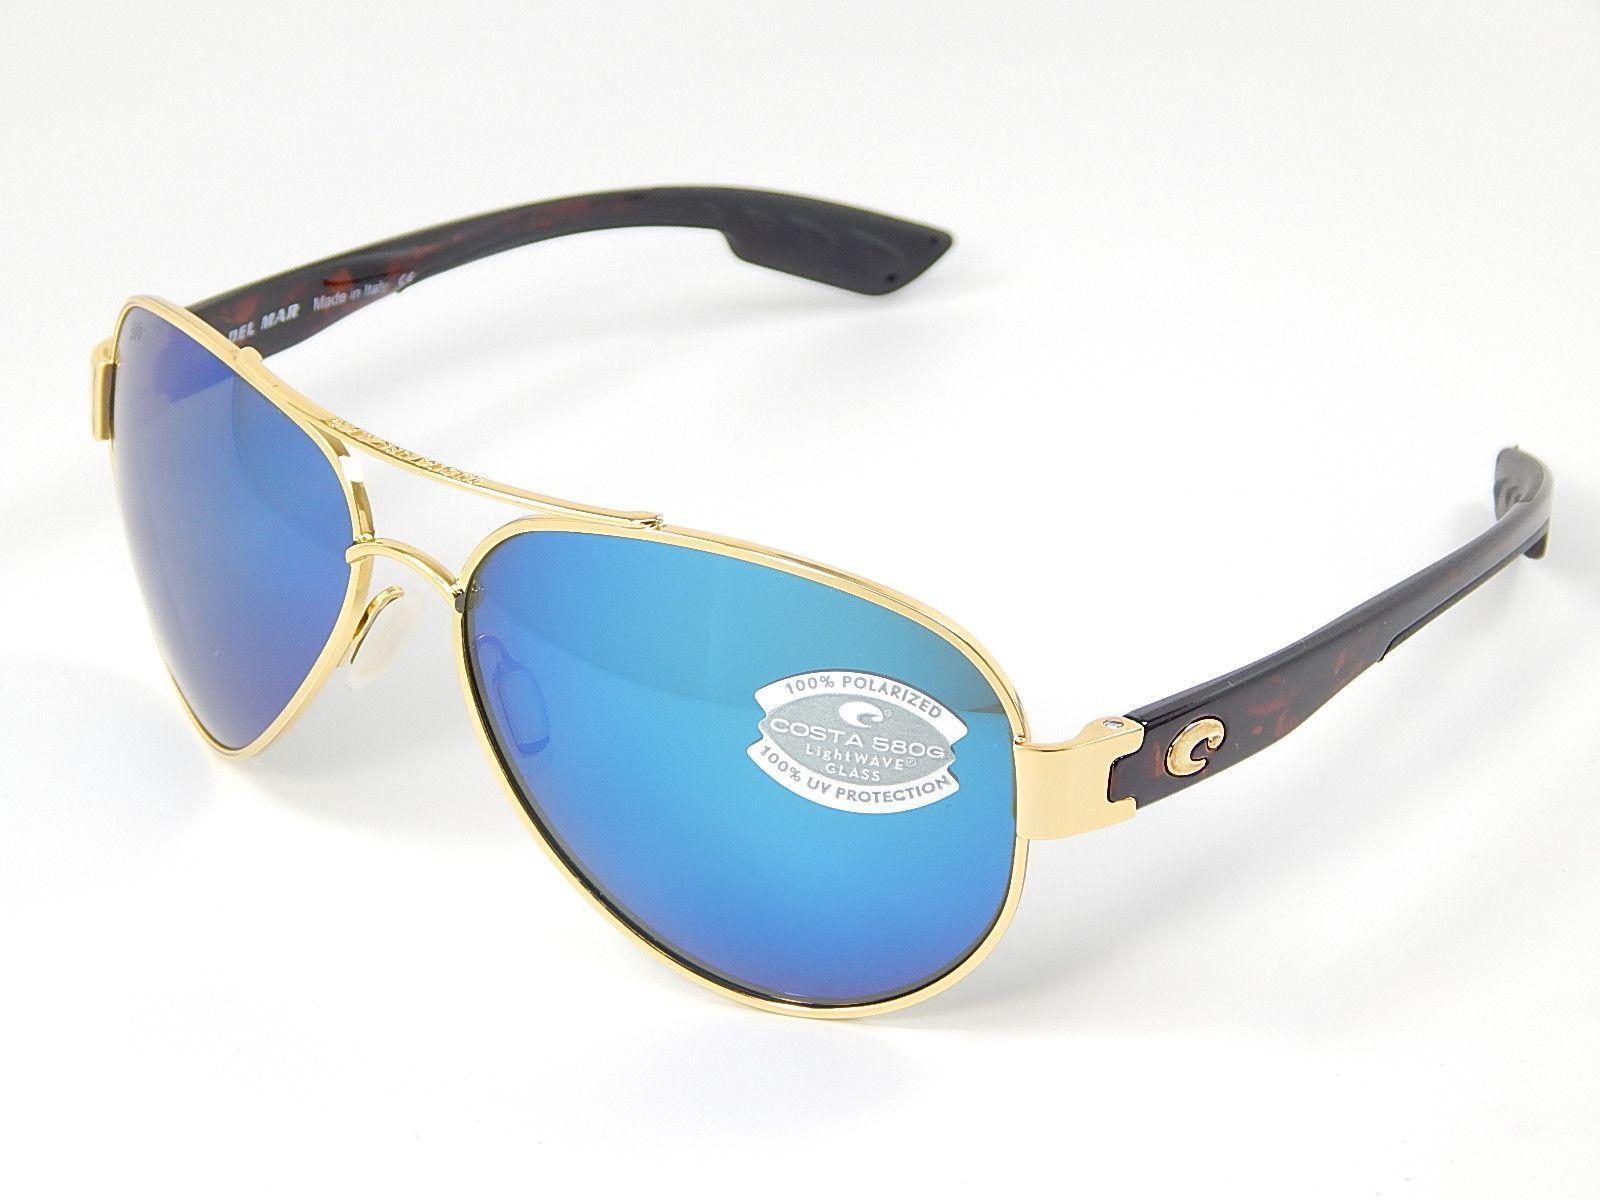 dada6cebe4a Costa Del Mar South Point 580G Gold Blue Mirror Polarized Sunglasses ...